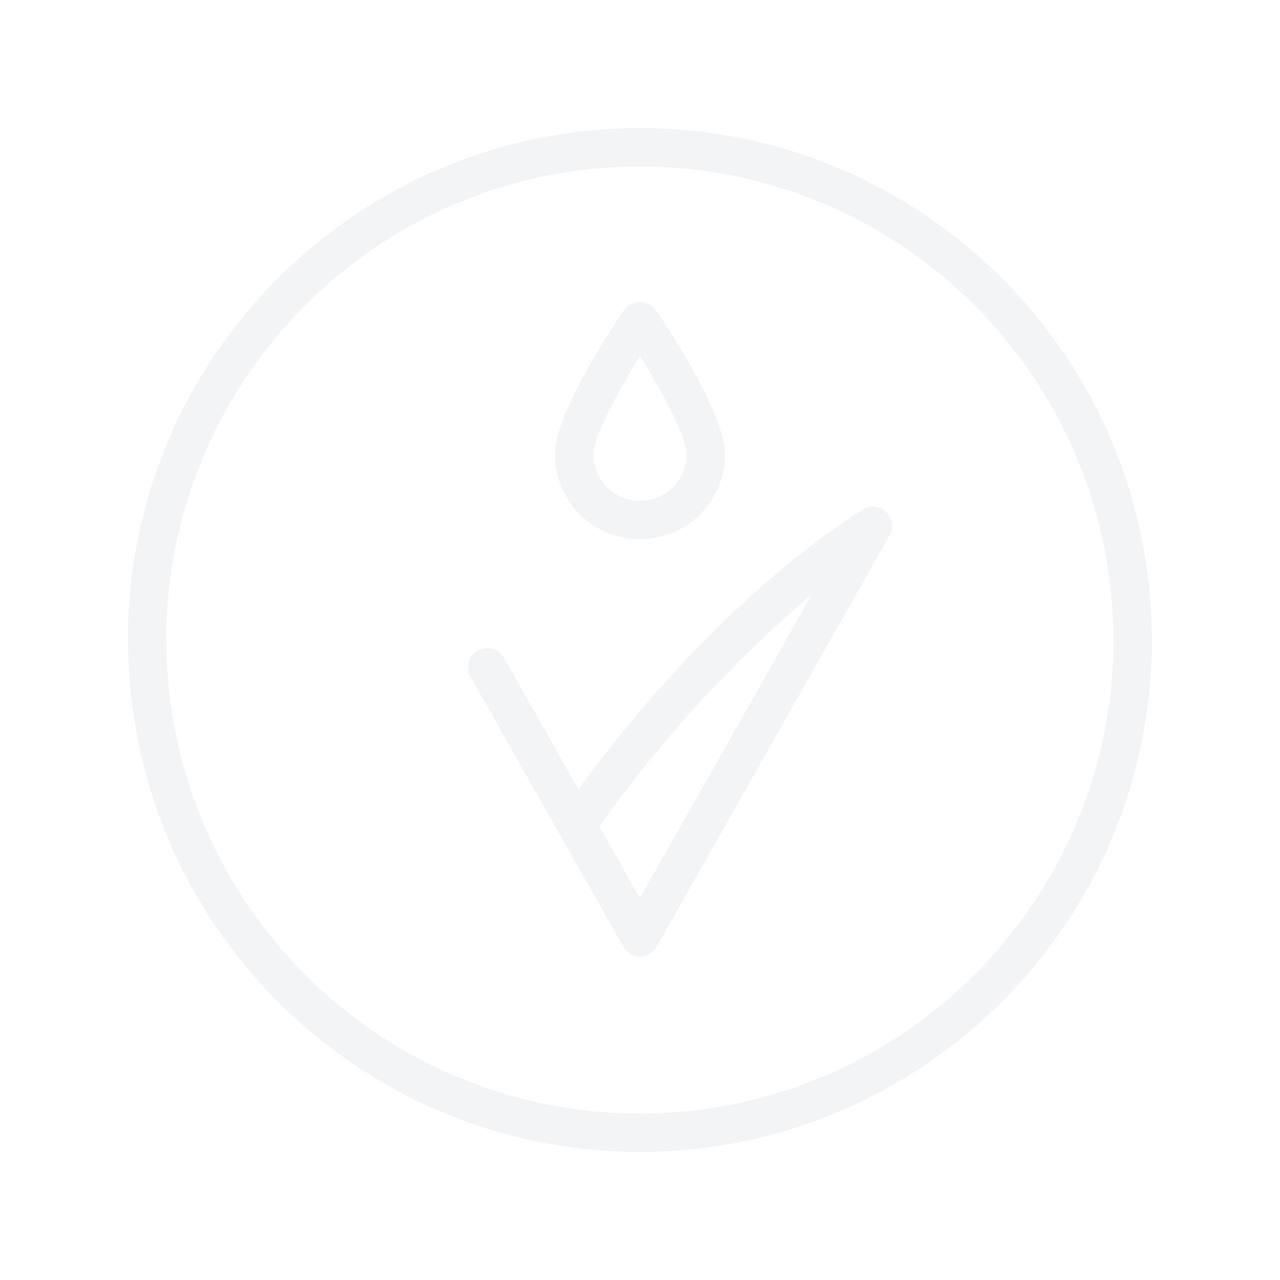 BAREMINERALS Skinlongevity Vital Power Eye Gel Cream 15g